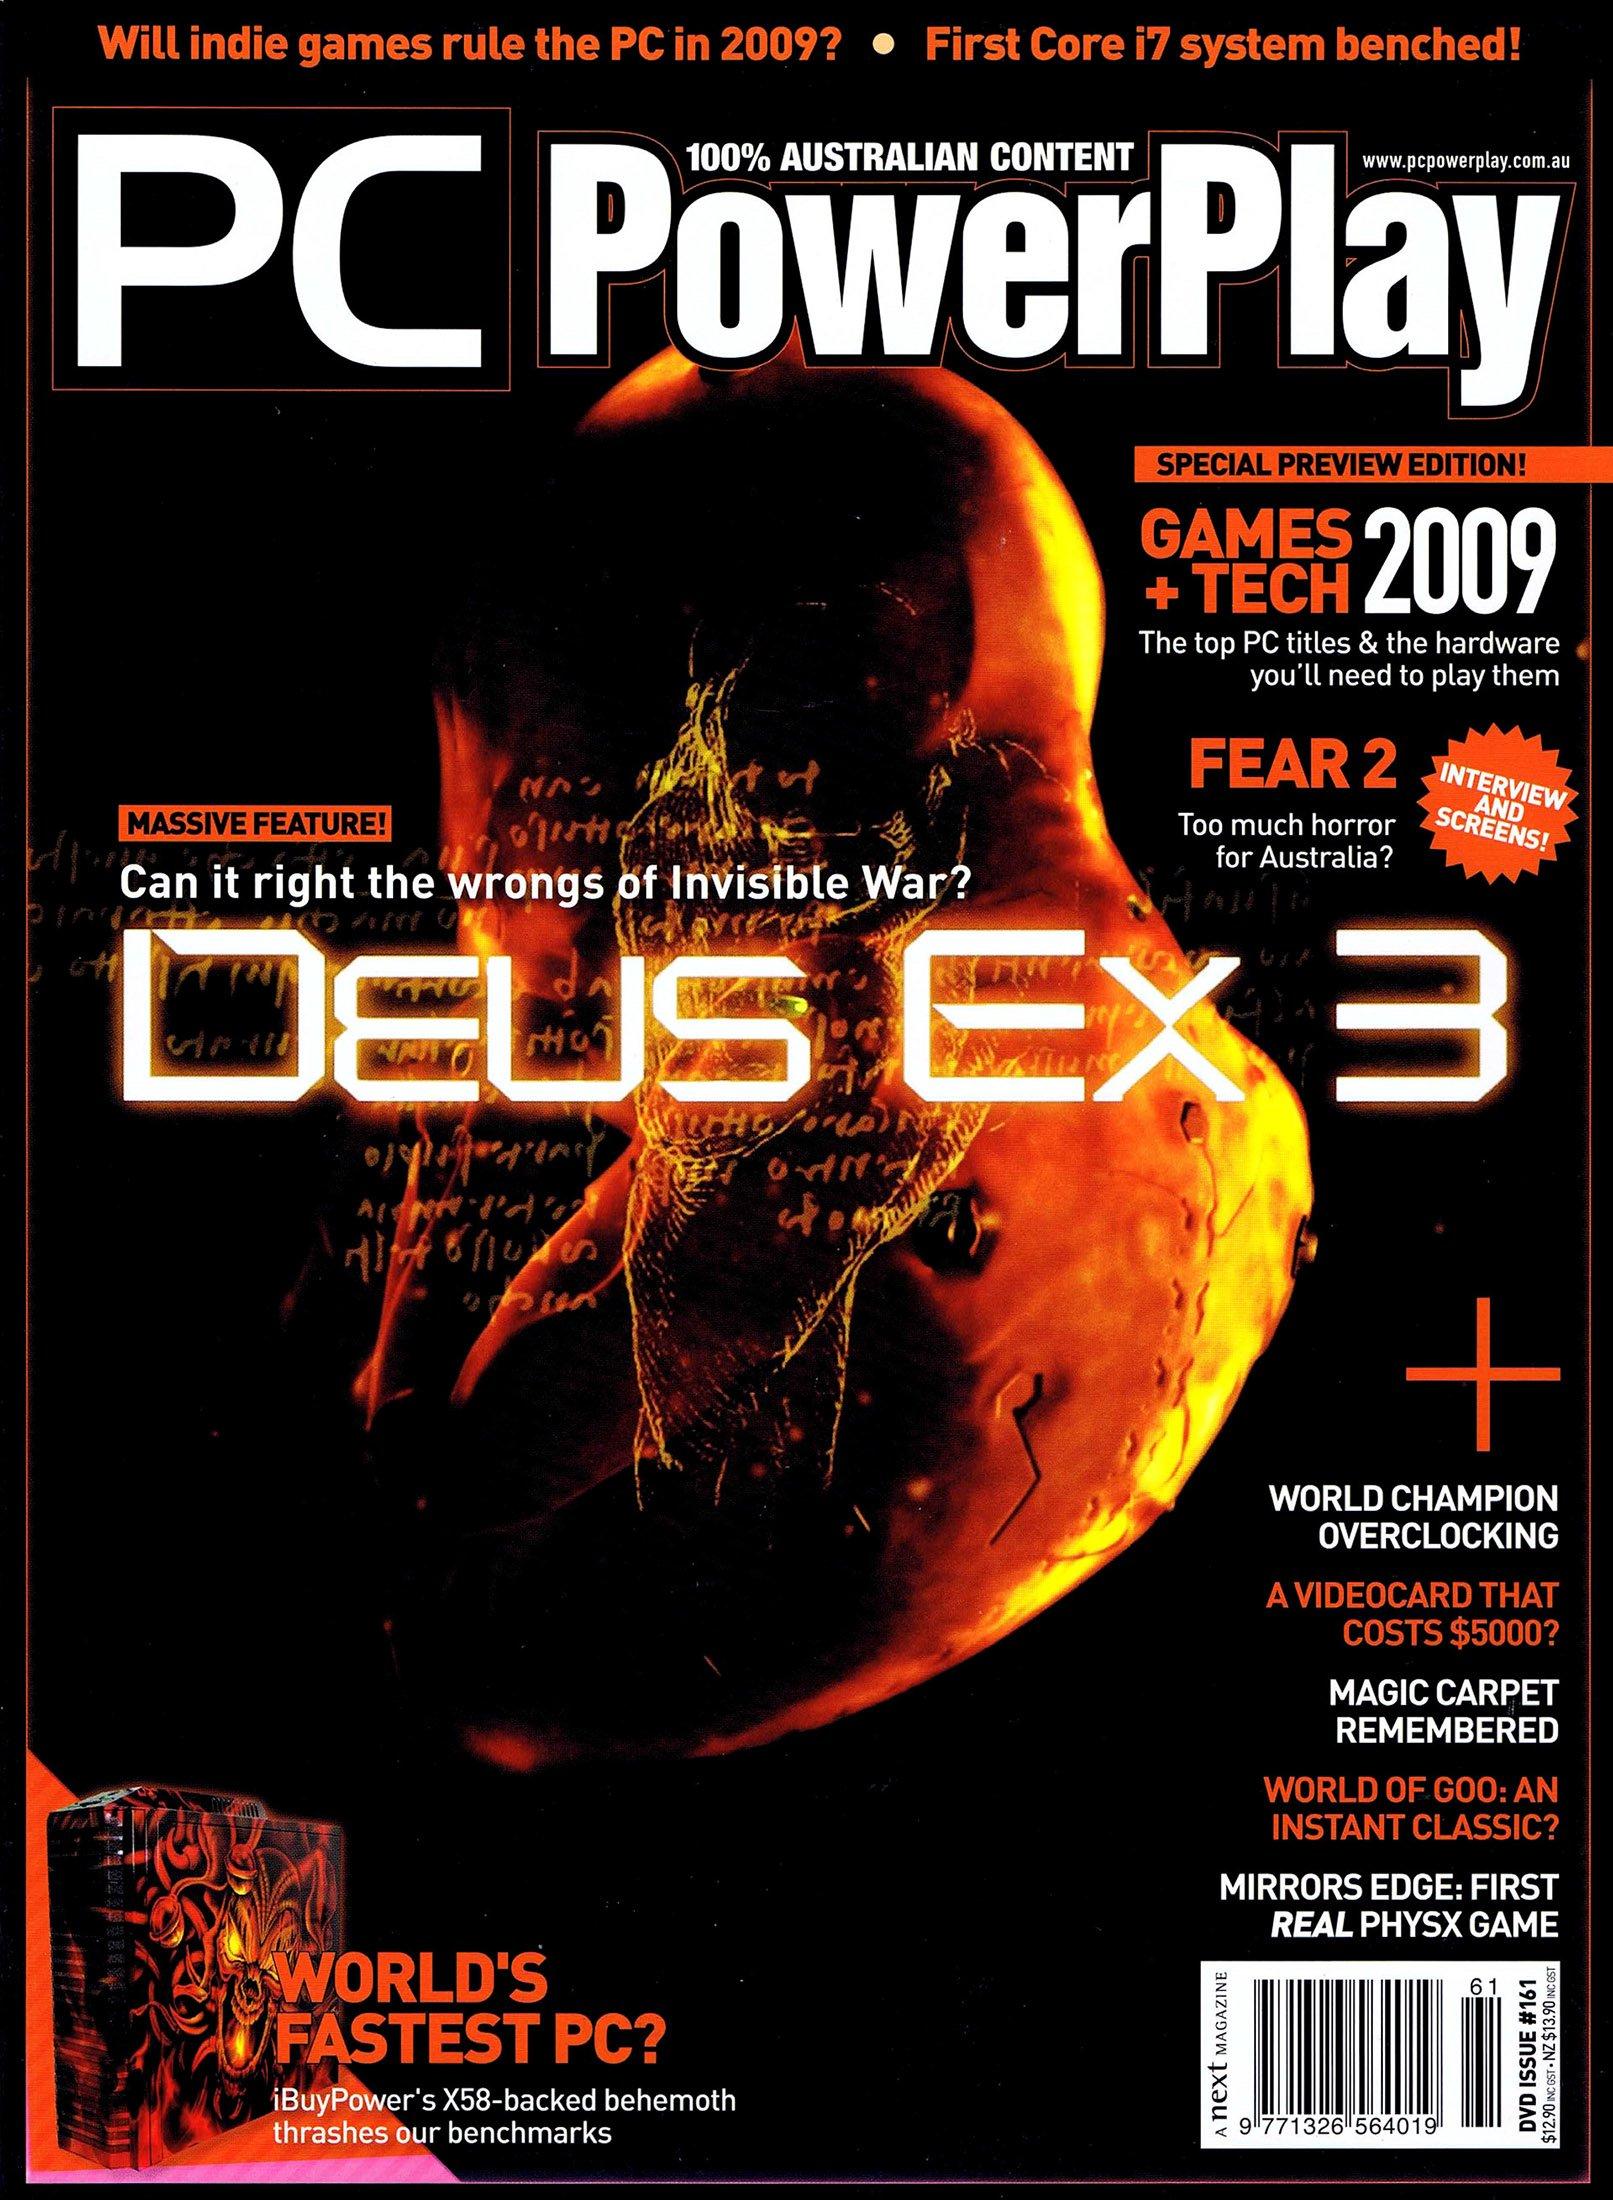 PC PowerPlay 161 (February 2009)